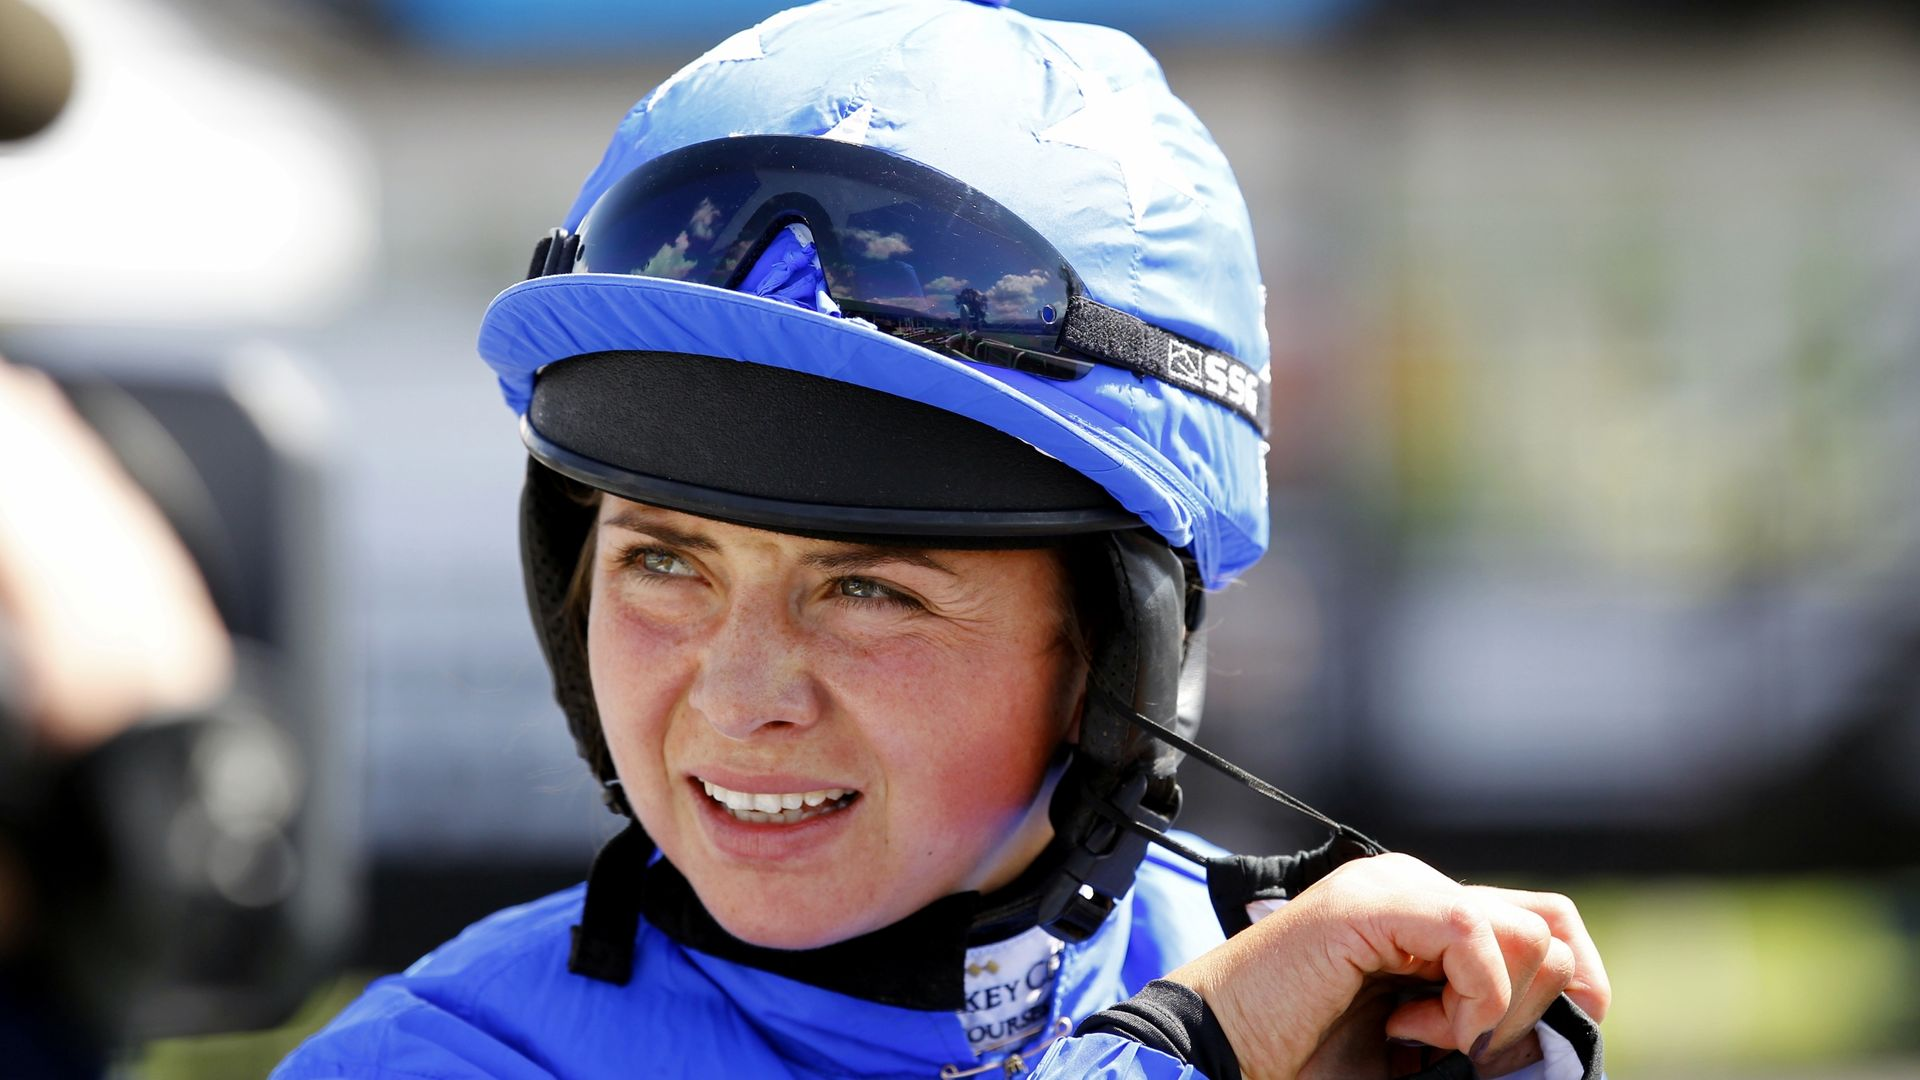 PJA call for BHA to end investigation into jockey probe |  Racing News